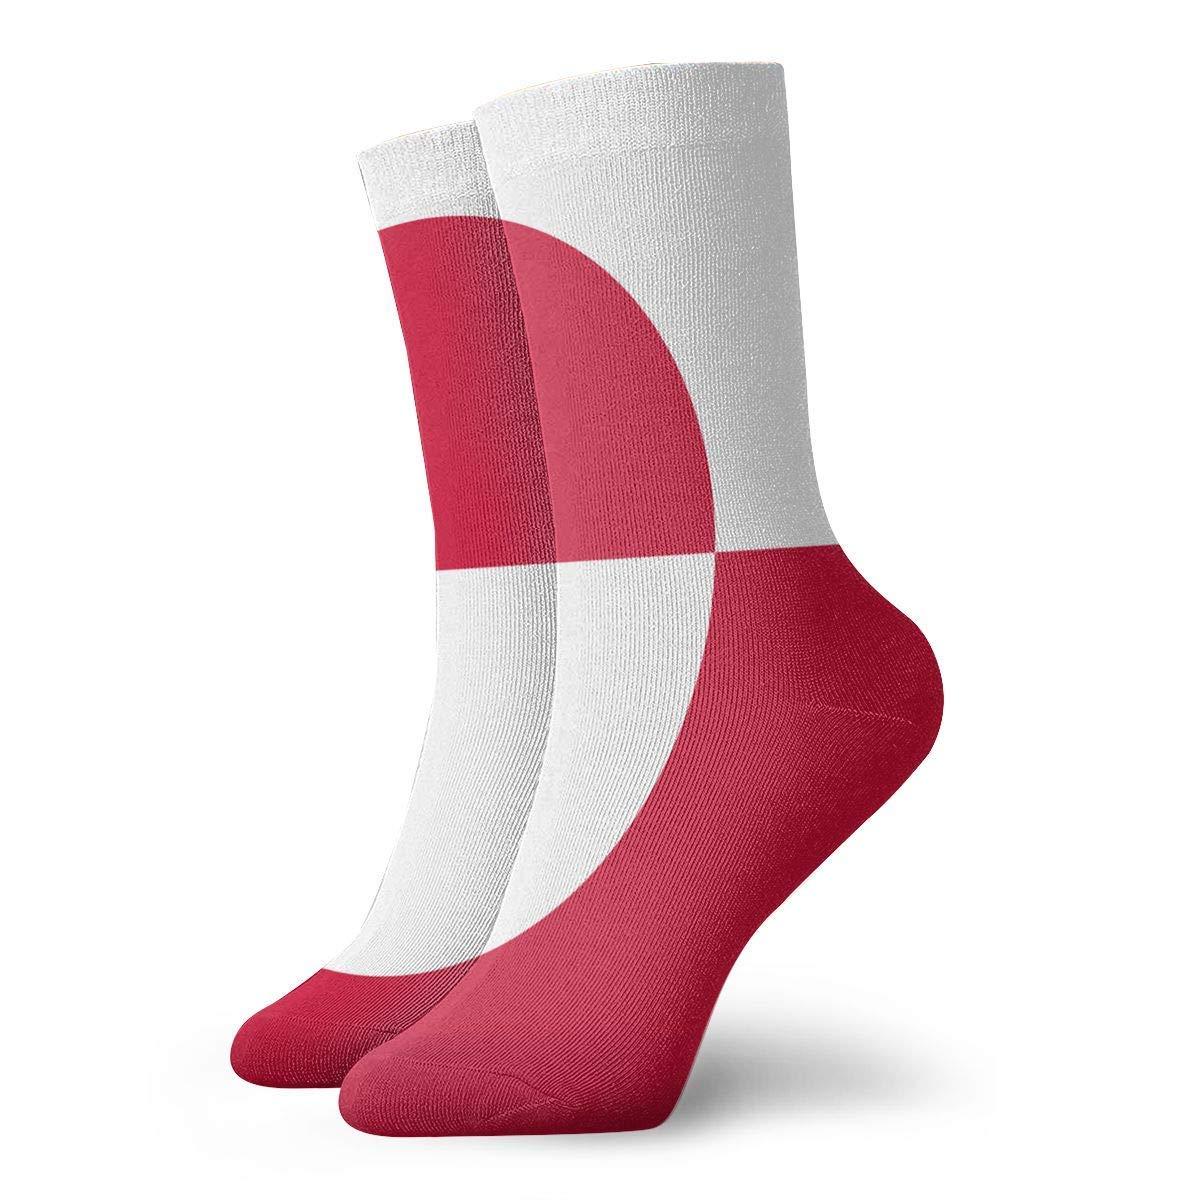 MIPU SHANGMAO Flag Of Greenland Mens Long Sports Socks Baseball Soccer Sock